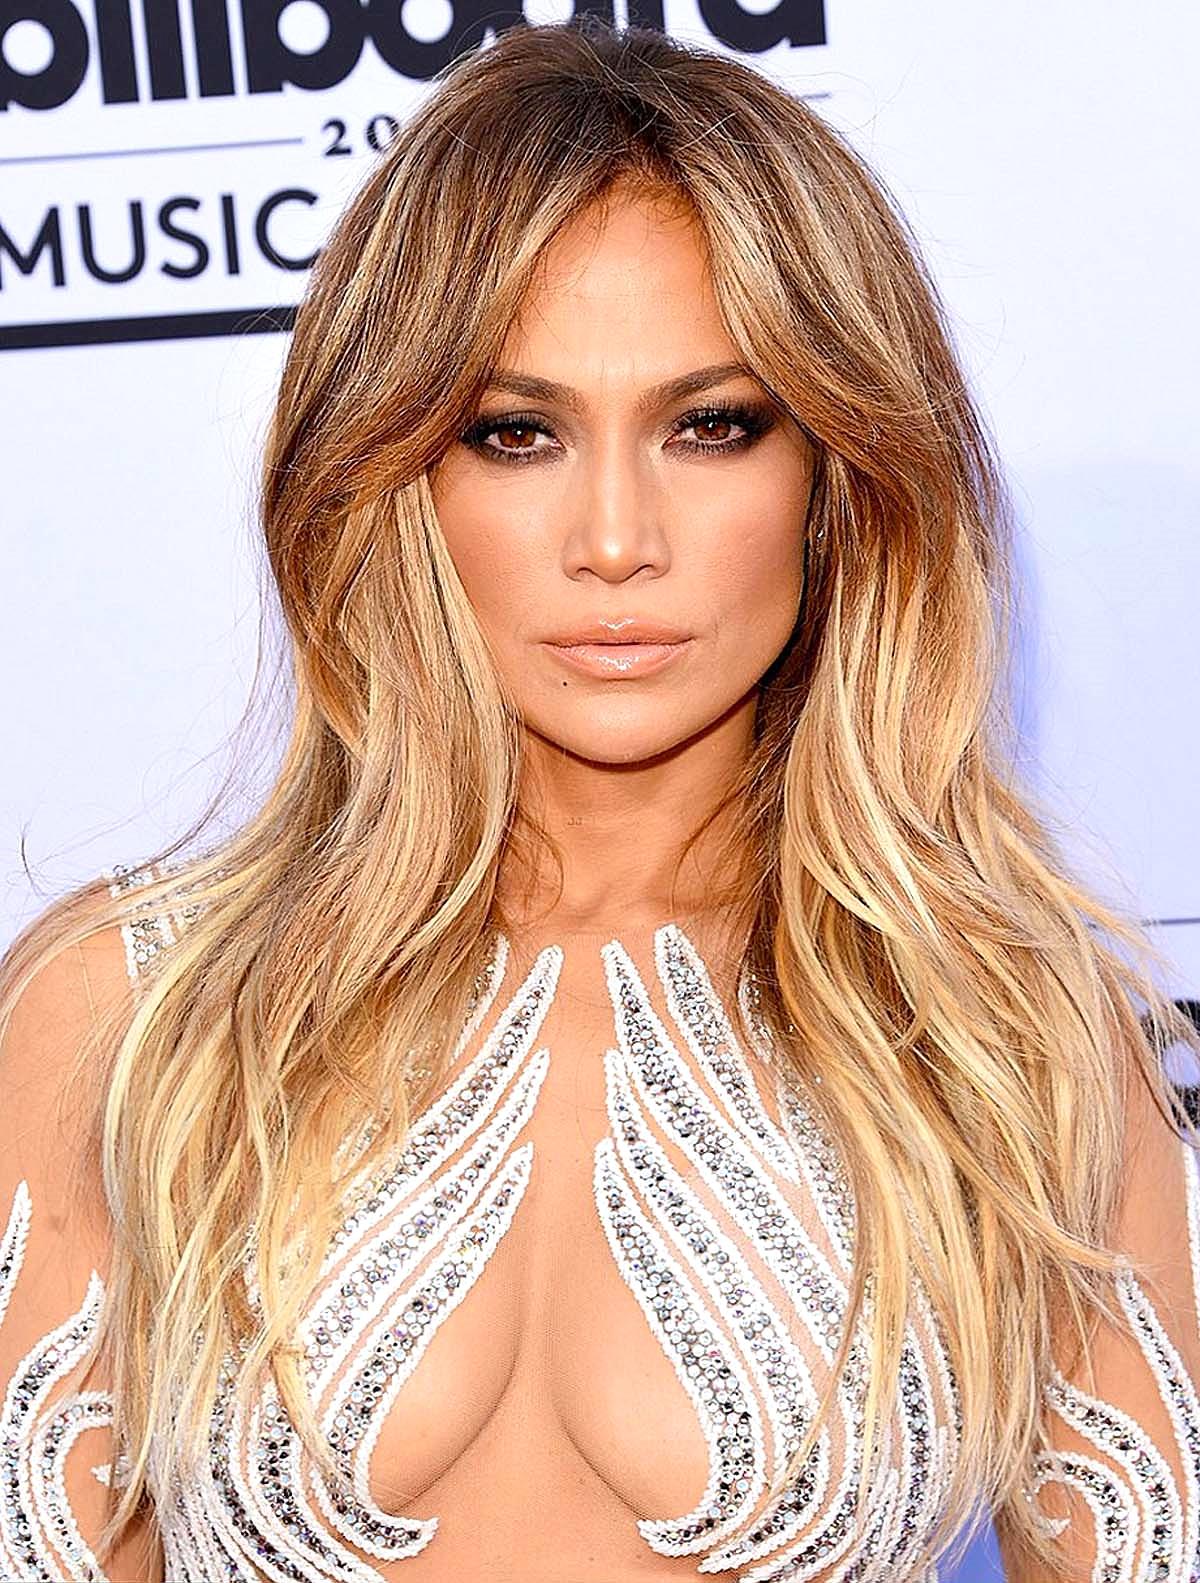 Jennifer Lopez in Charbel Zoe Couture Getty Images/ Jason Merritt